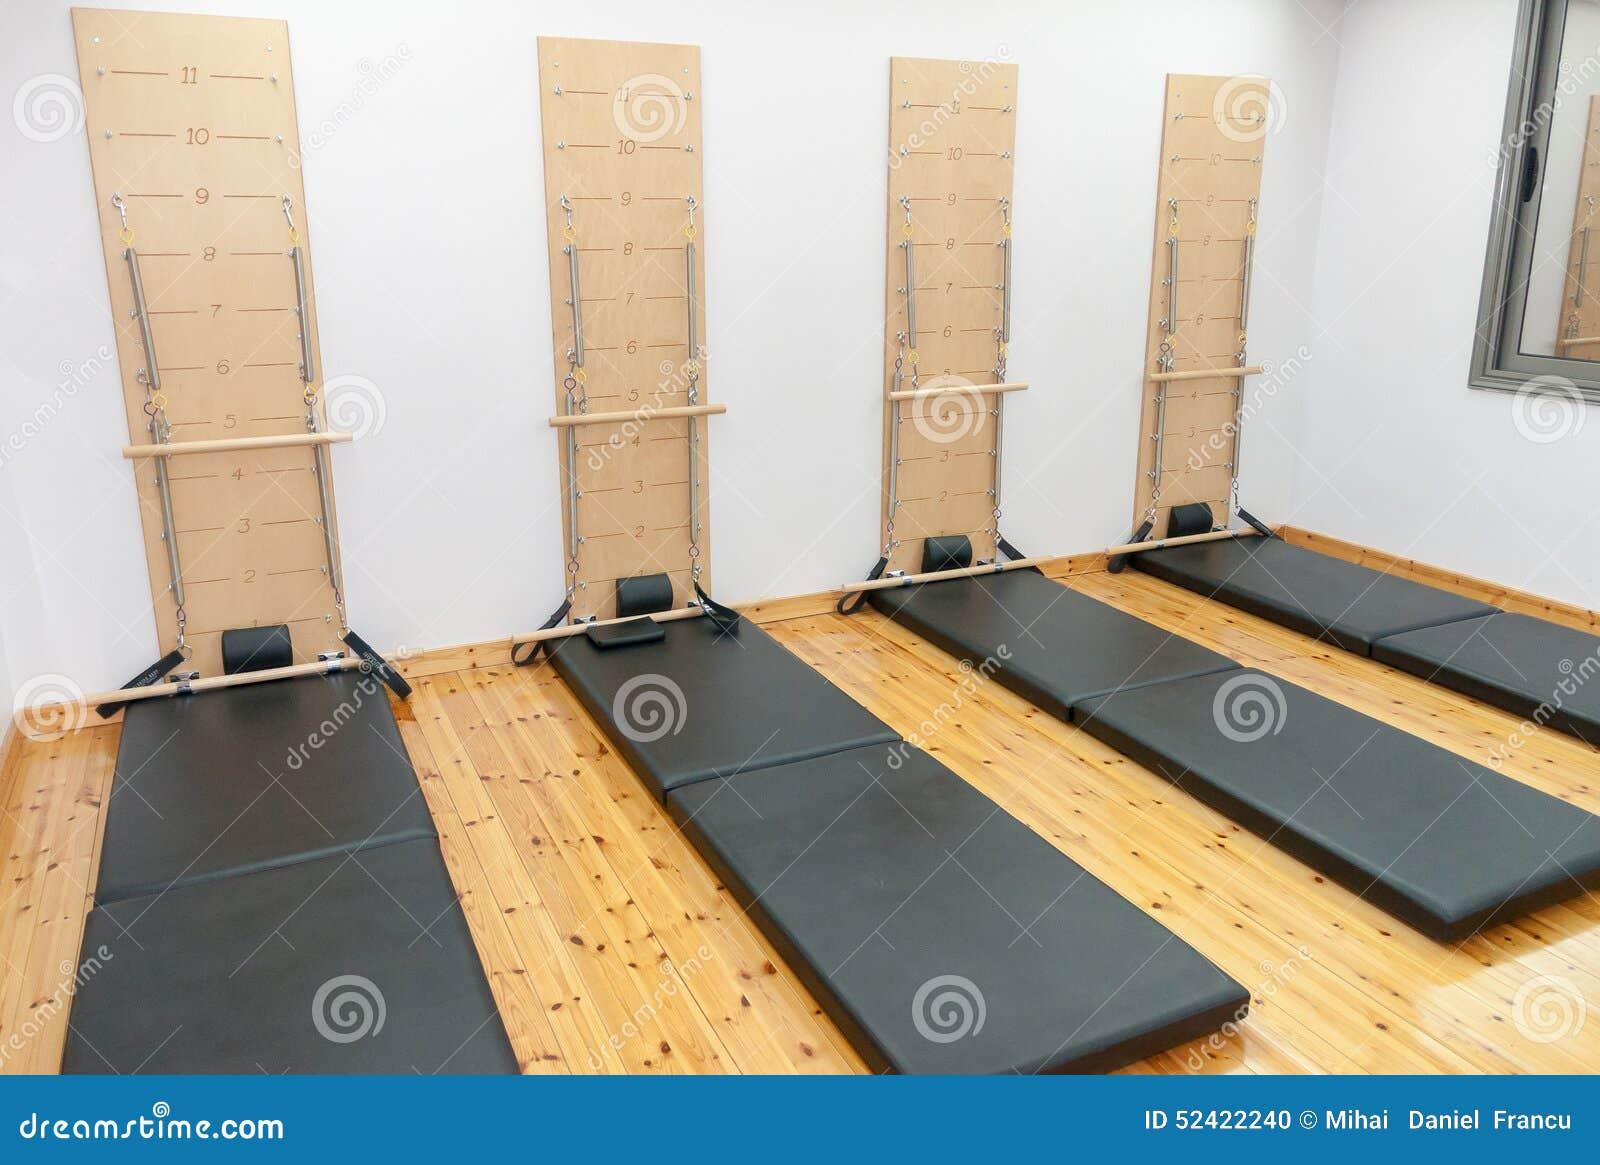 Aerobic Pilates room stock photo. Image of abdominal - 52422240